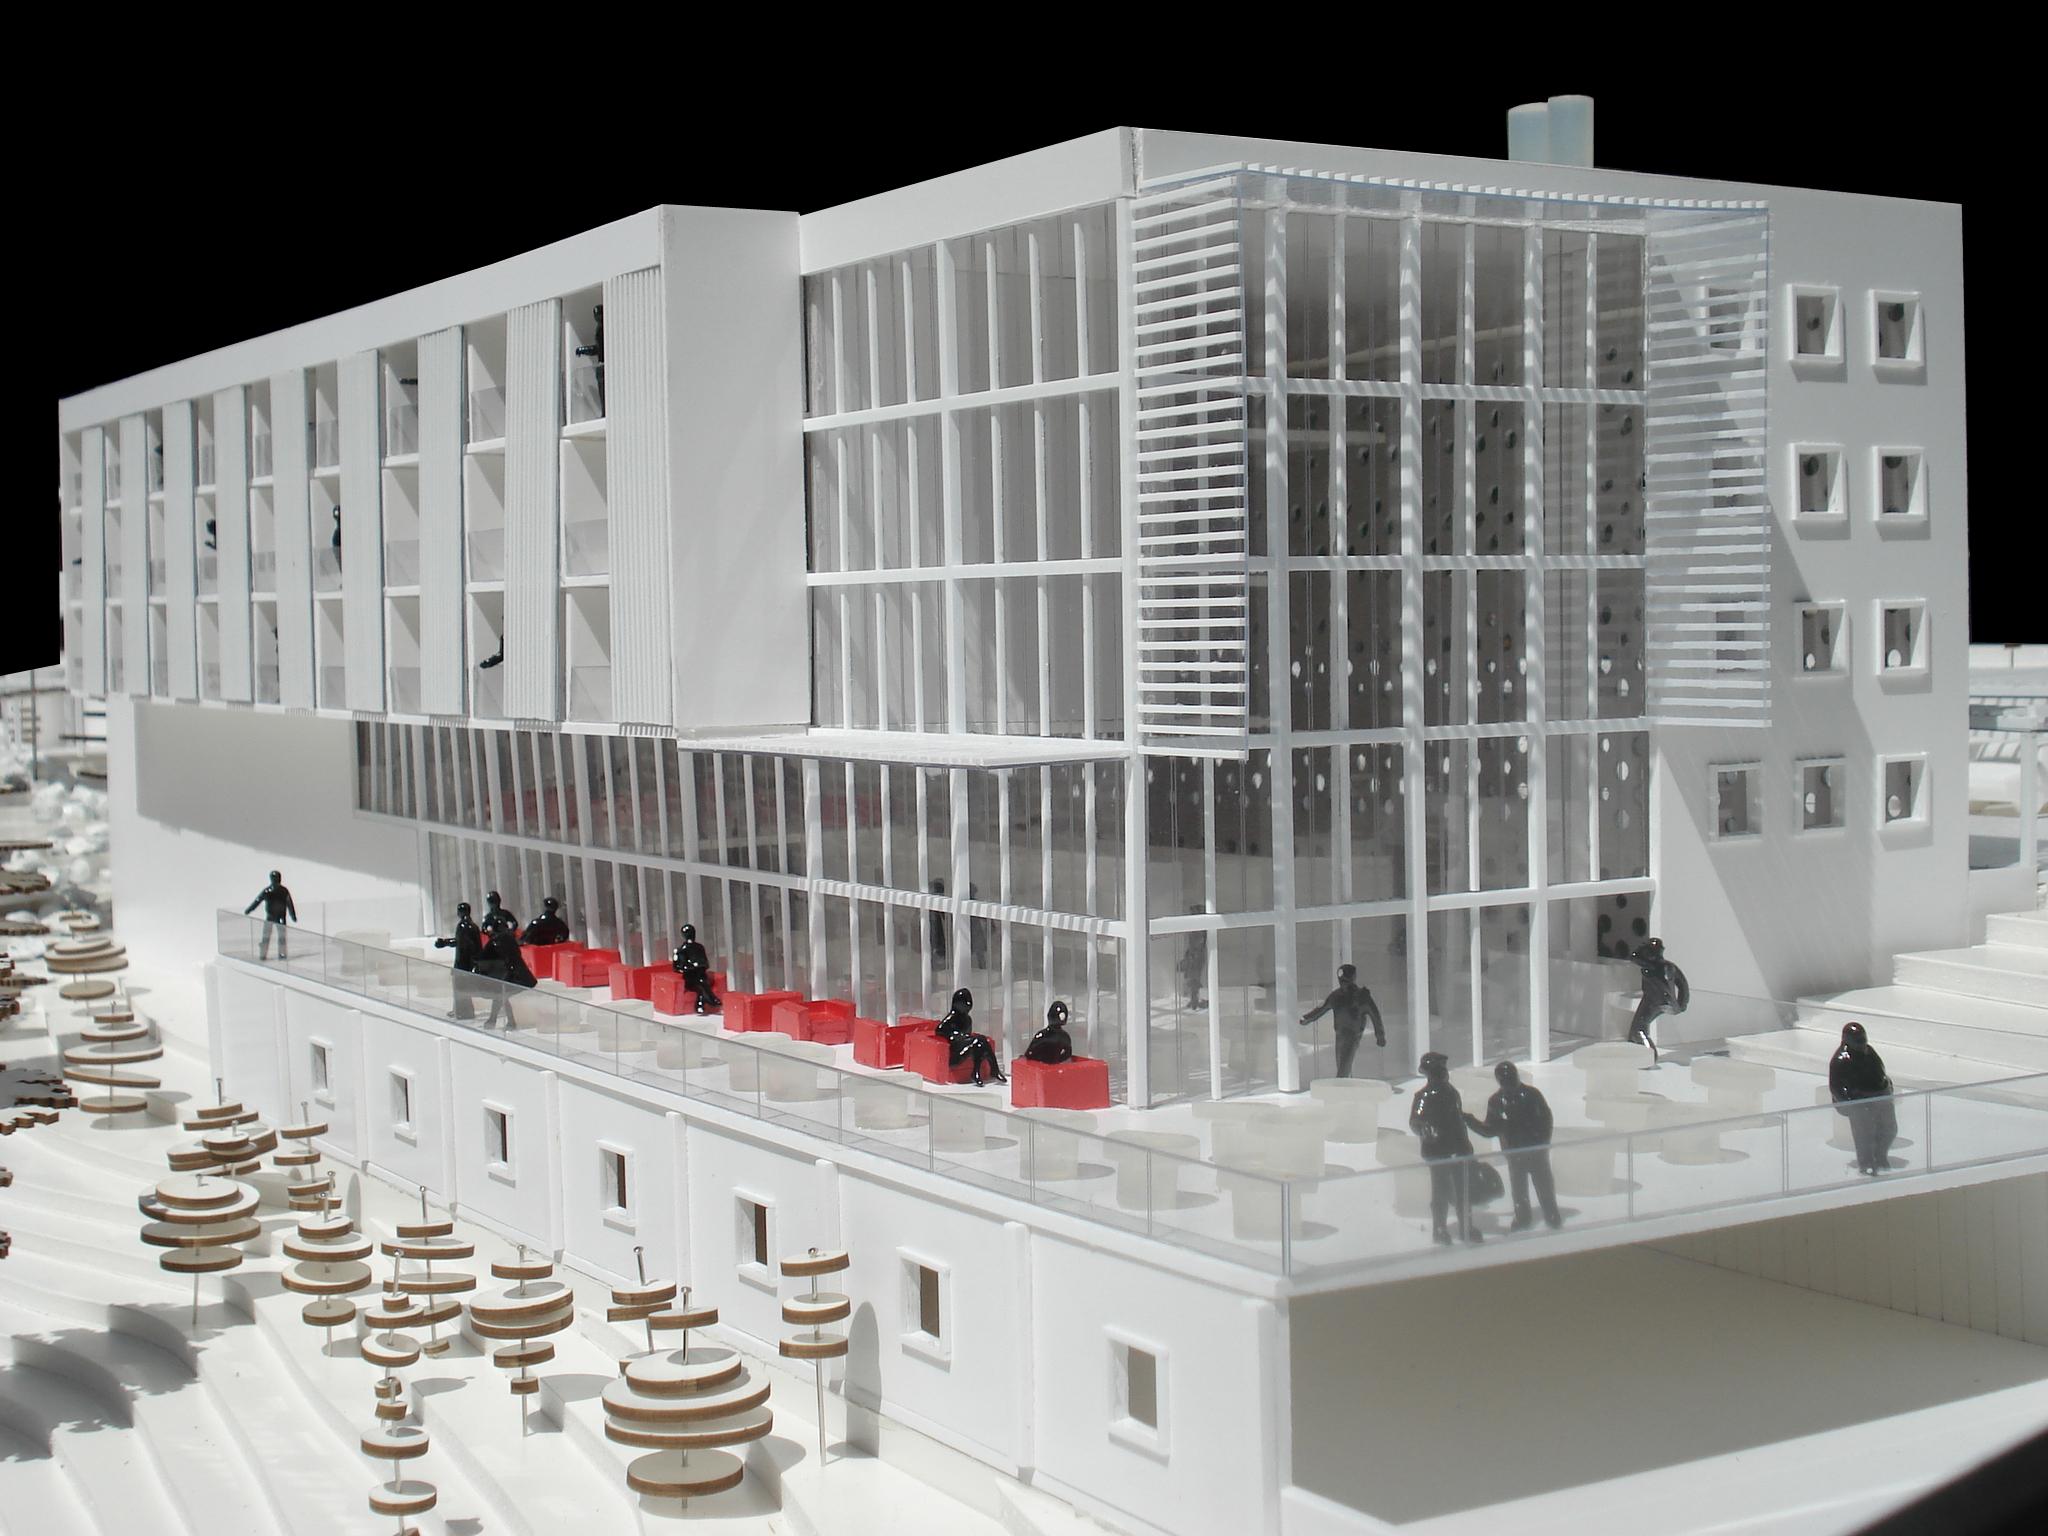 Maquetas arquitectura - Arquitectura de casas ...